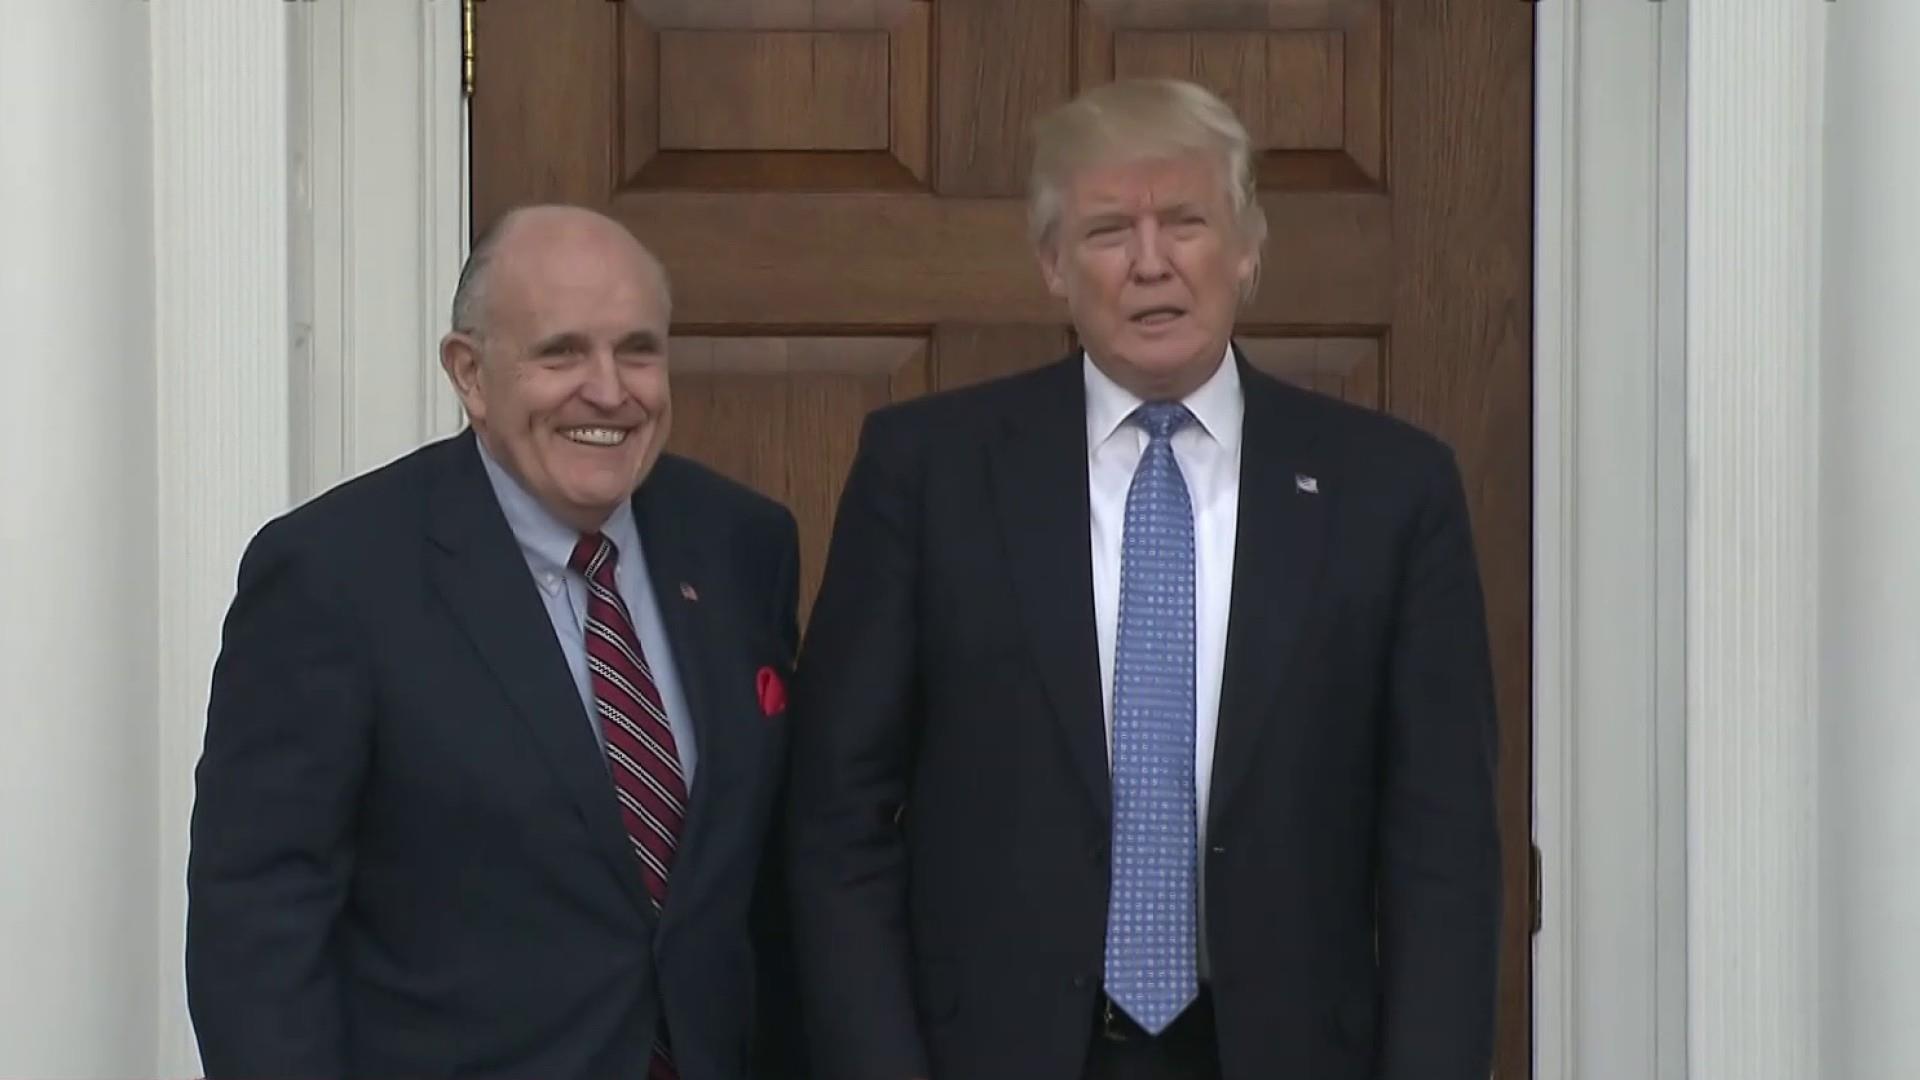 'Off the rails' : Longtime Trump lawyer slams Giuliani on Ukraine and criminal exposure